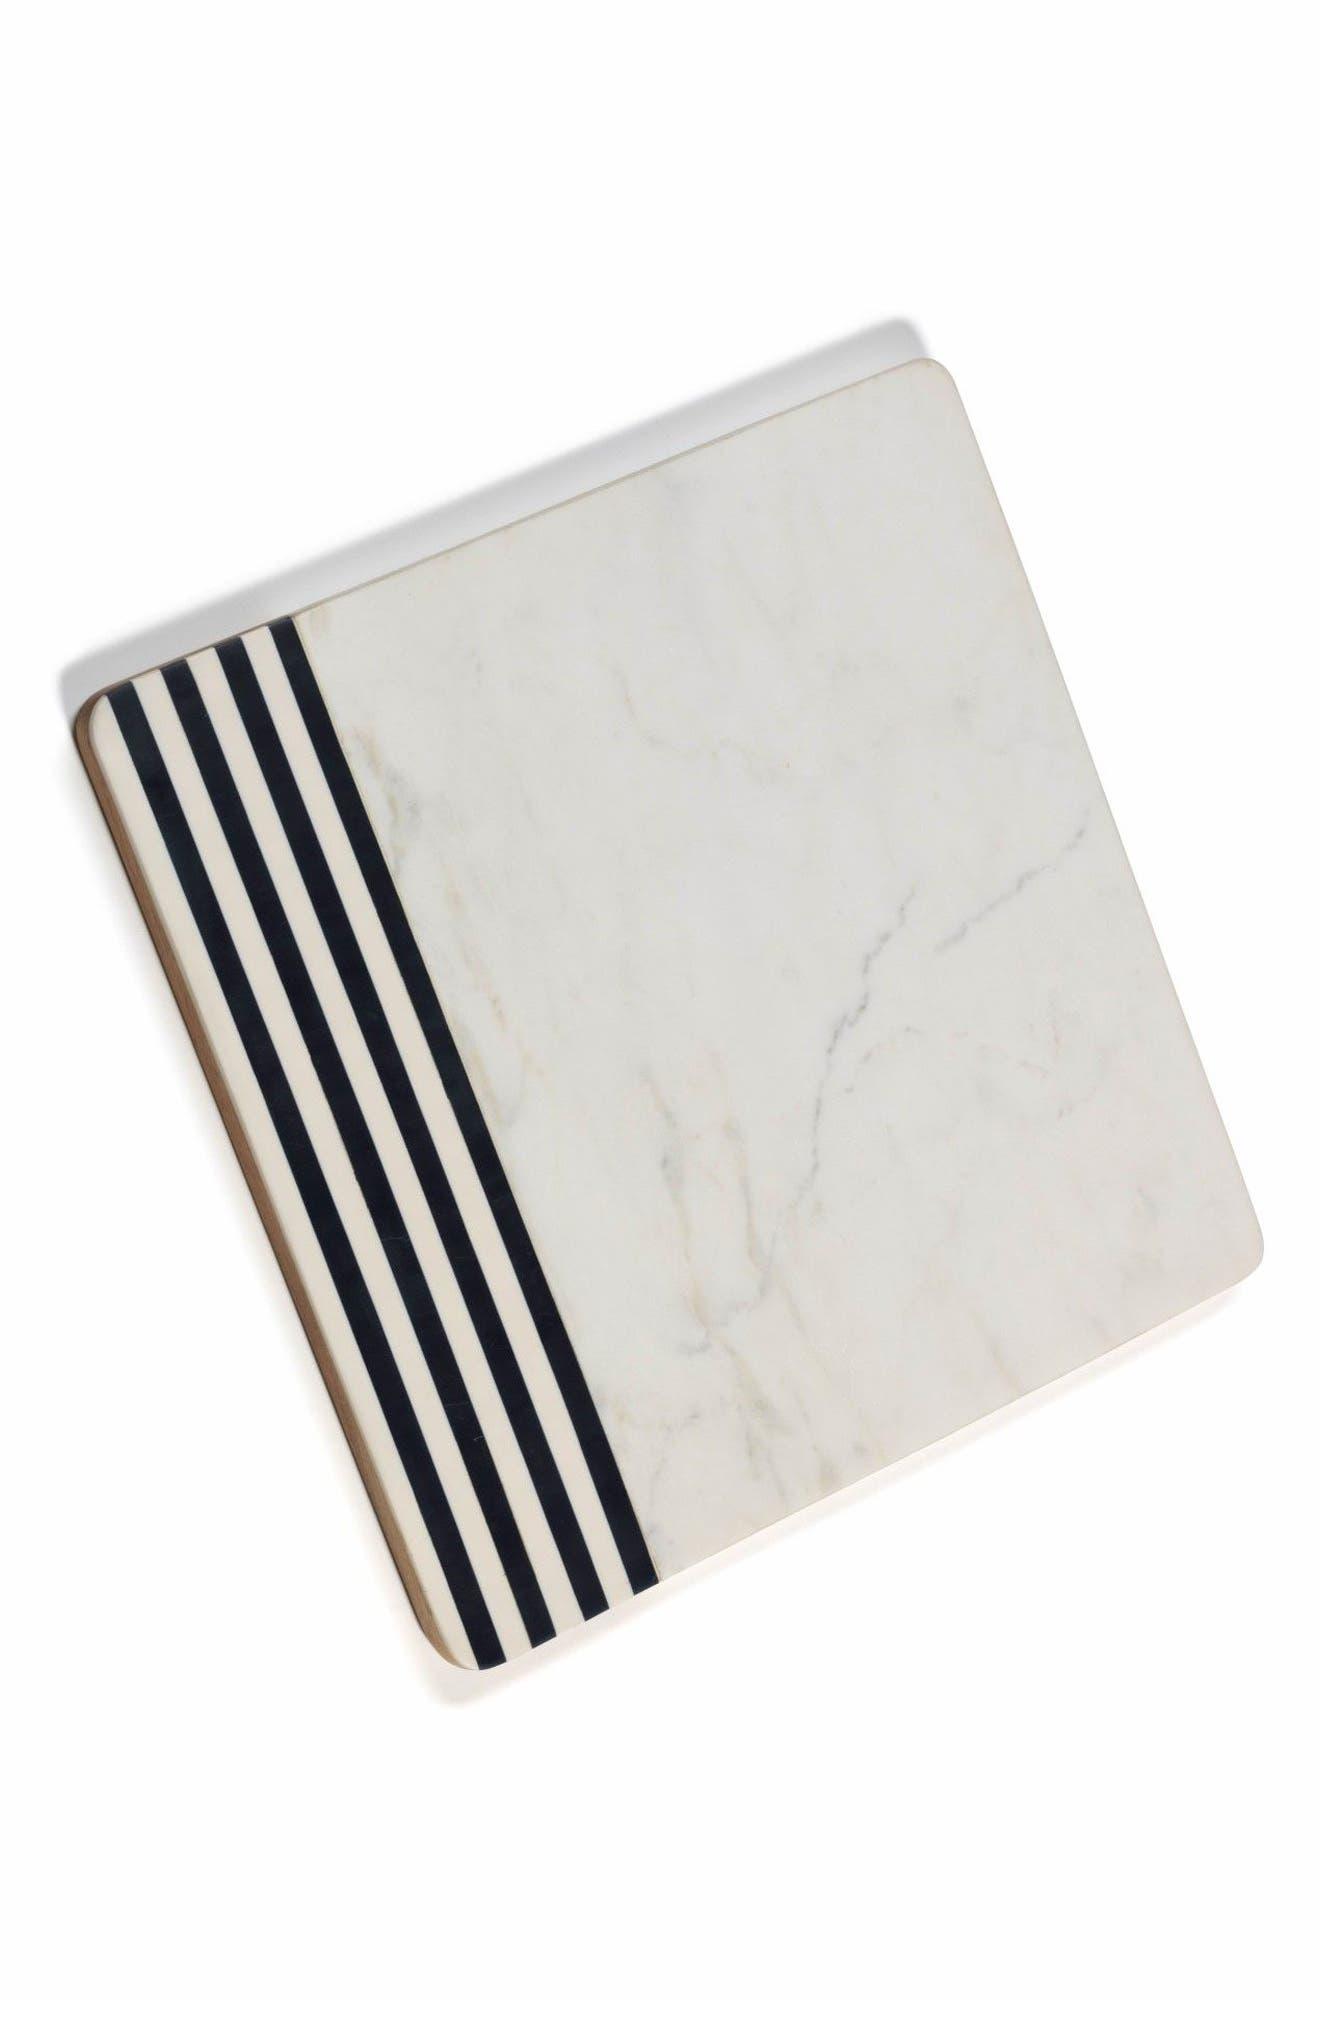 Marine Cutting Board,                         Main,                         color, White/ Black